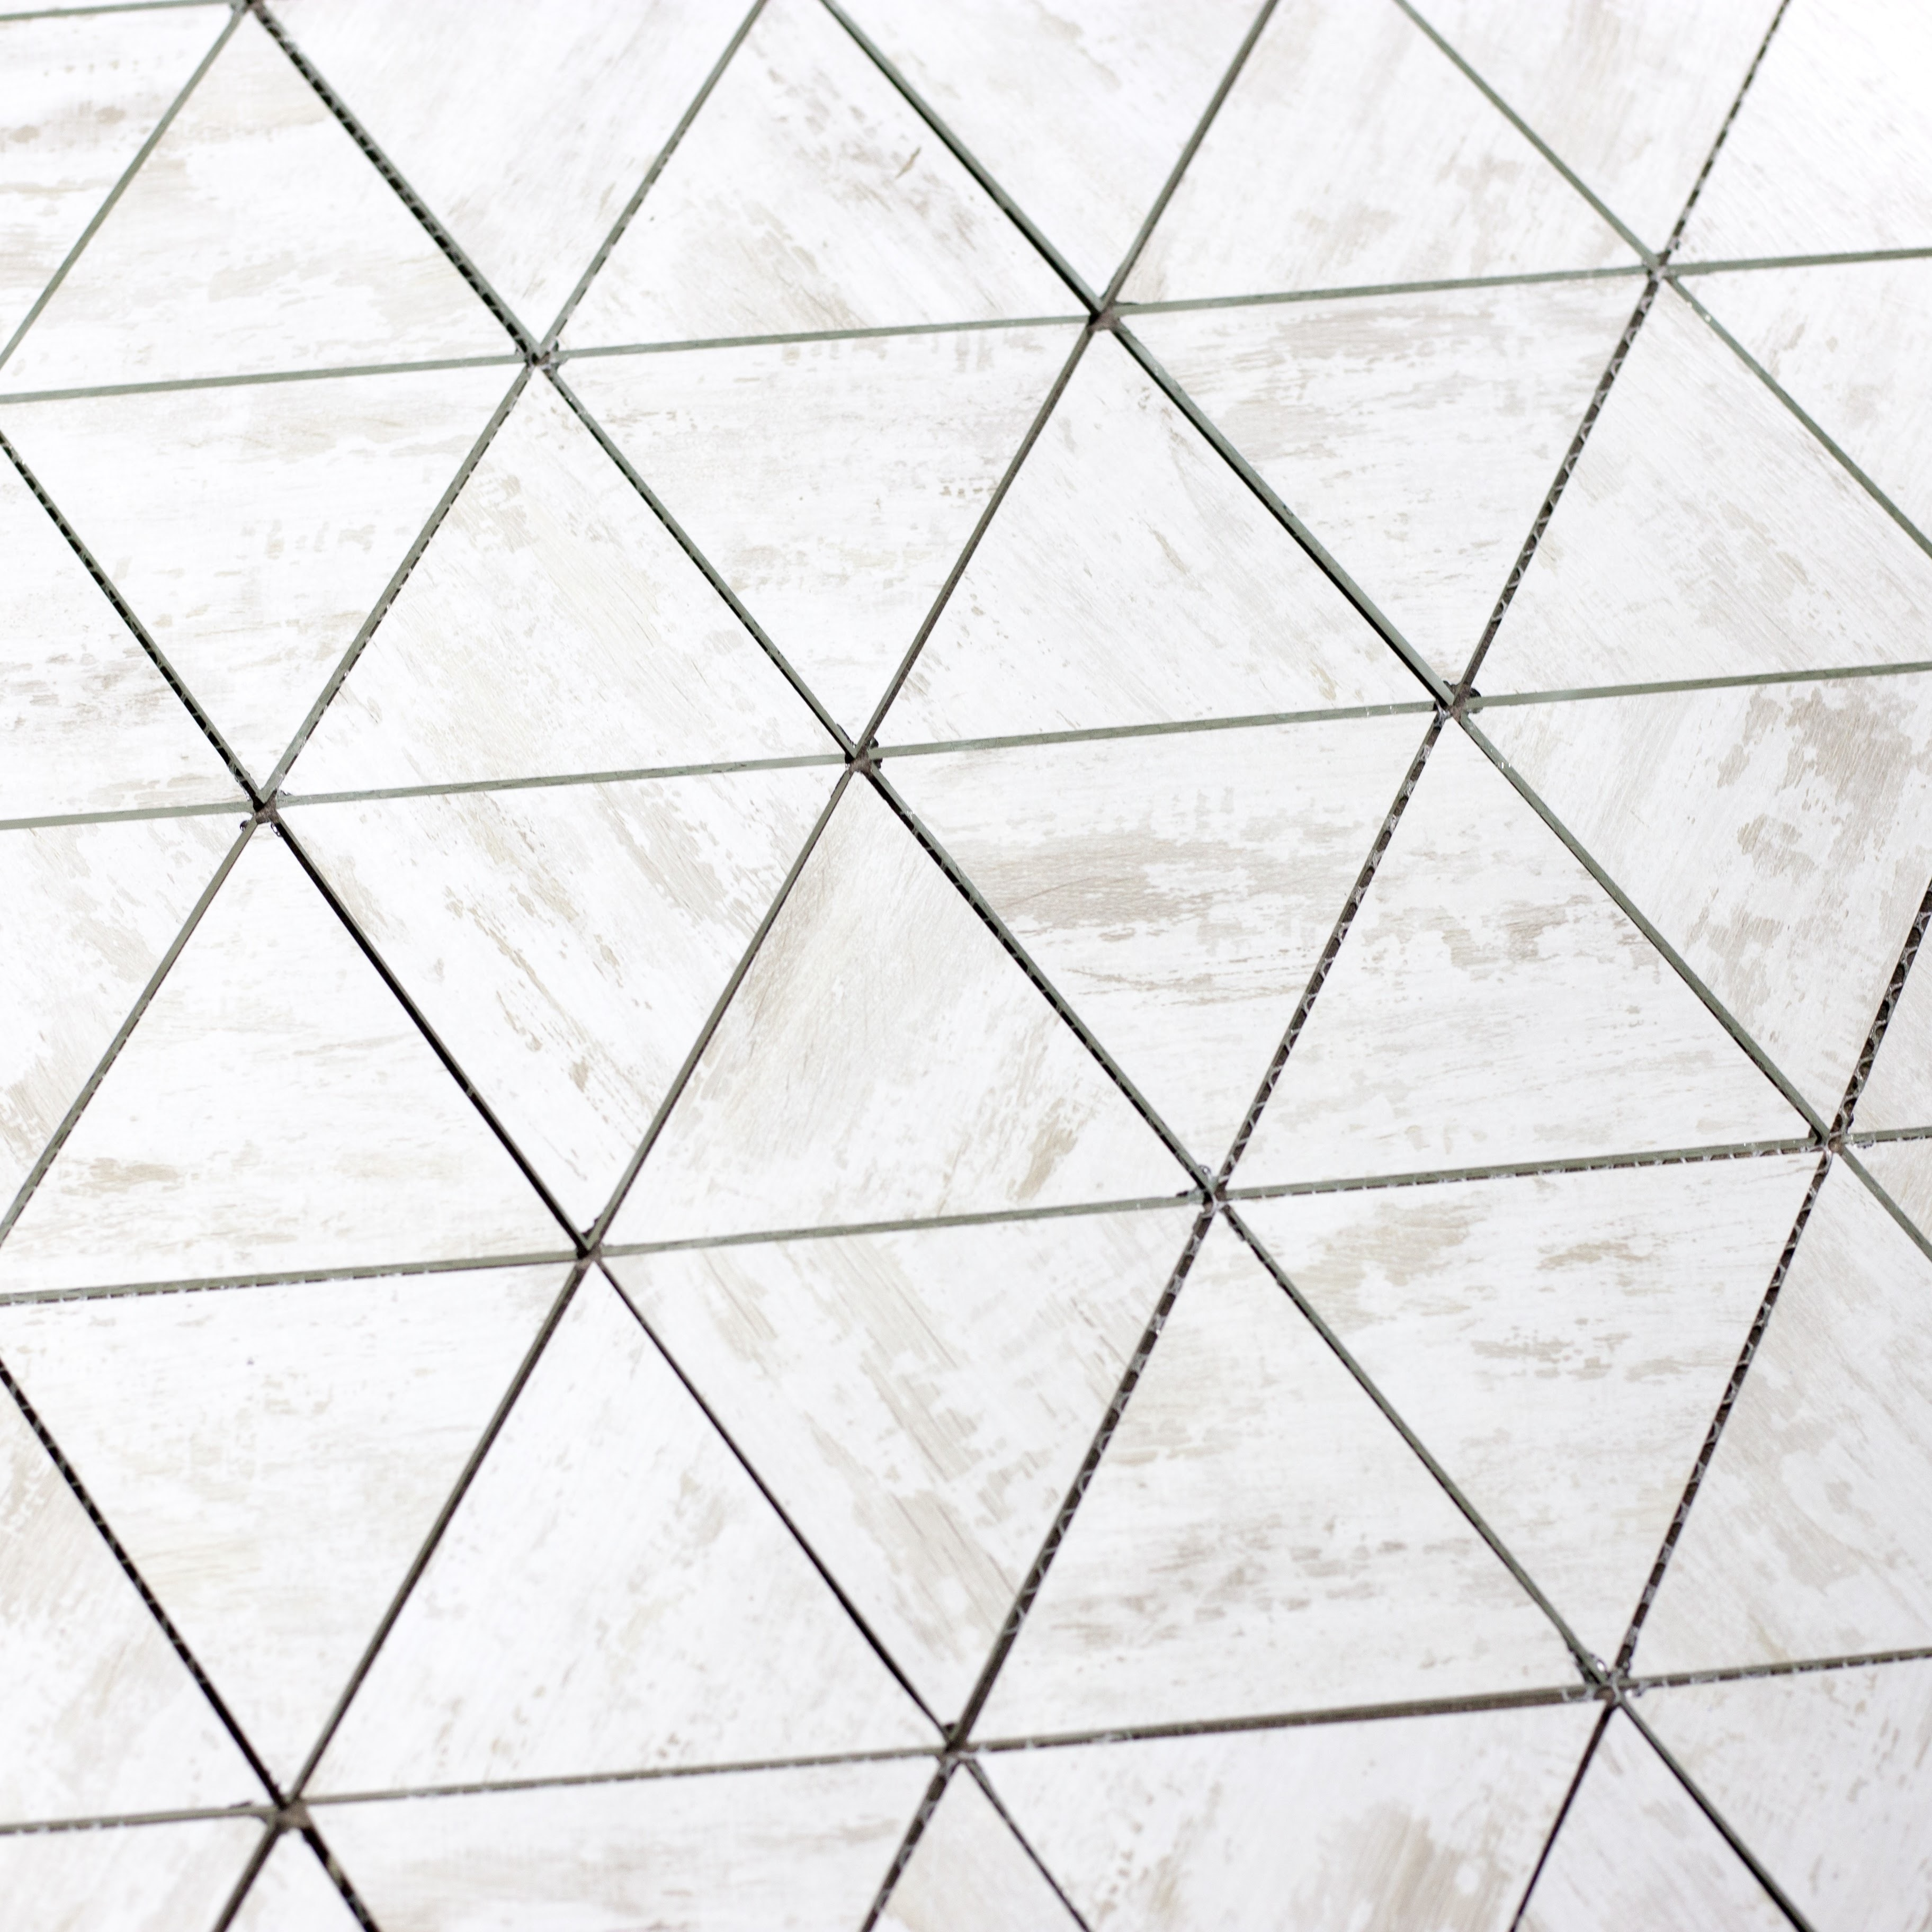 "Birchwood White Triangle Straight Edge / 11.625""x12"" / Flat Nature Collection 0"